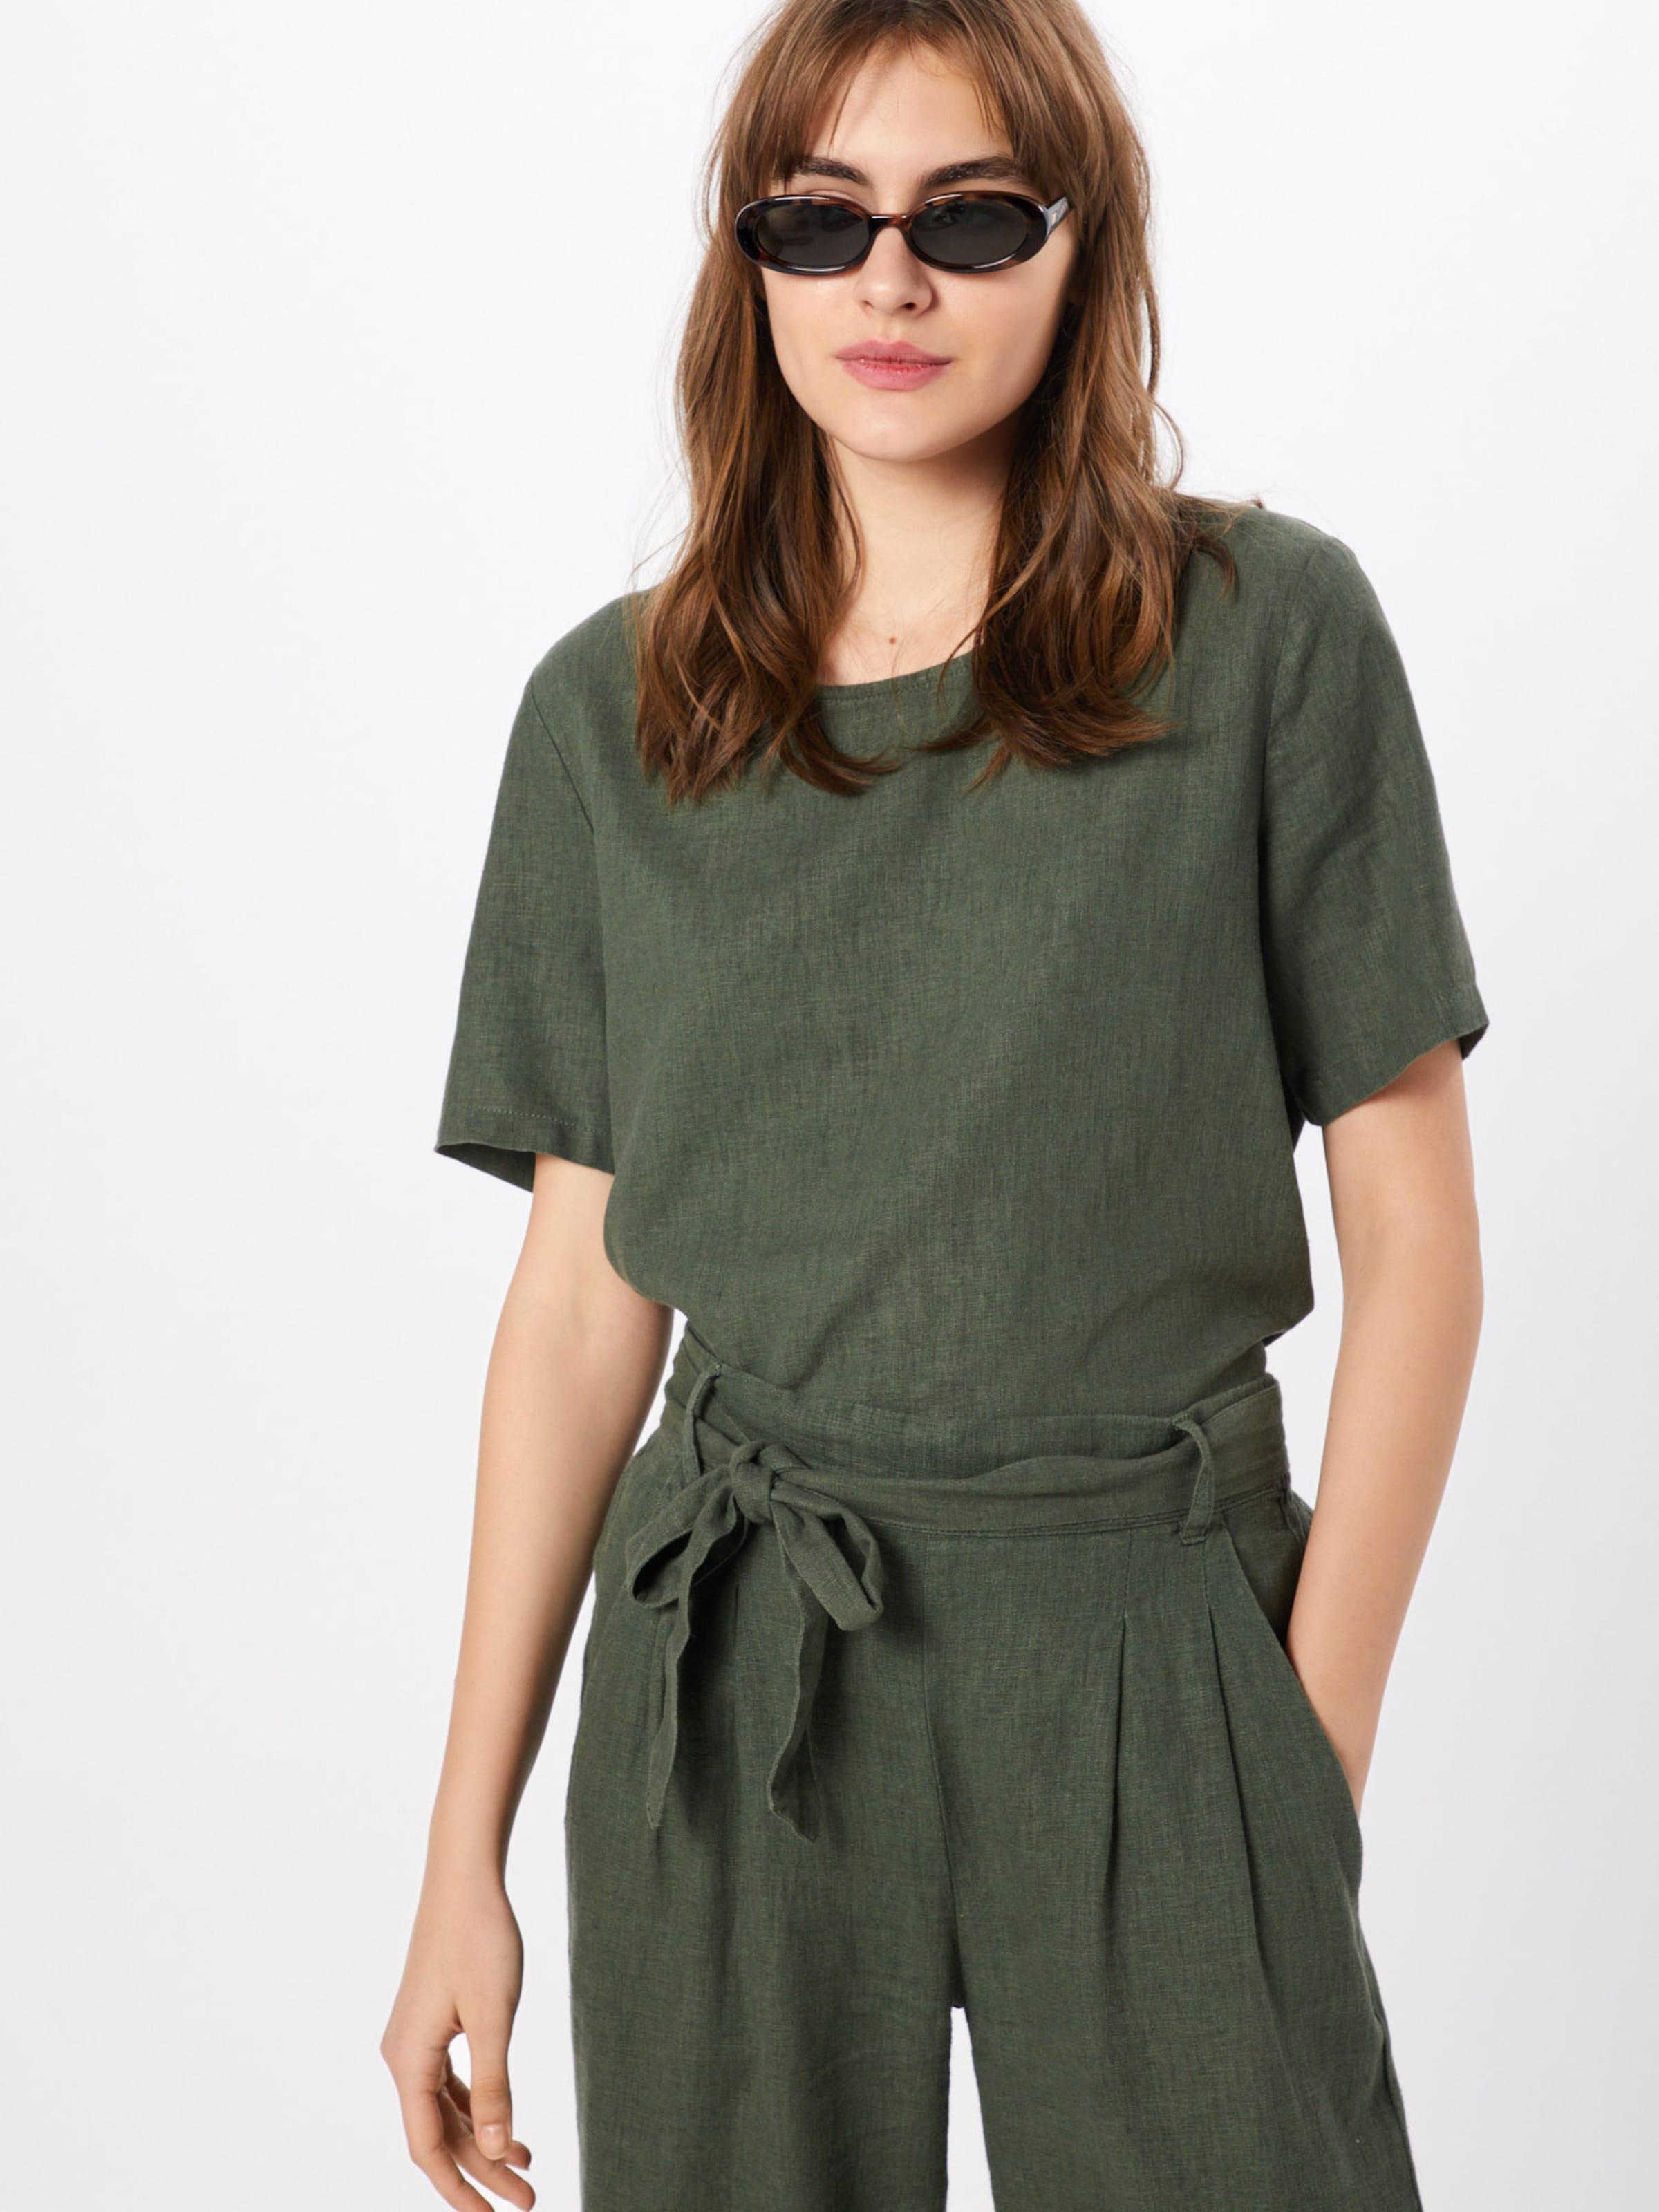 De Nuit Yong 'jake' En Jacqueline Bleu T shirt dBoeCx